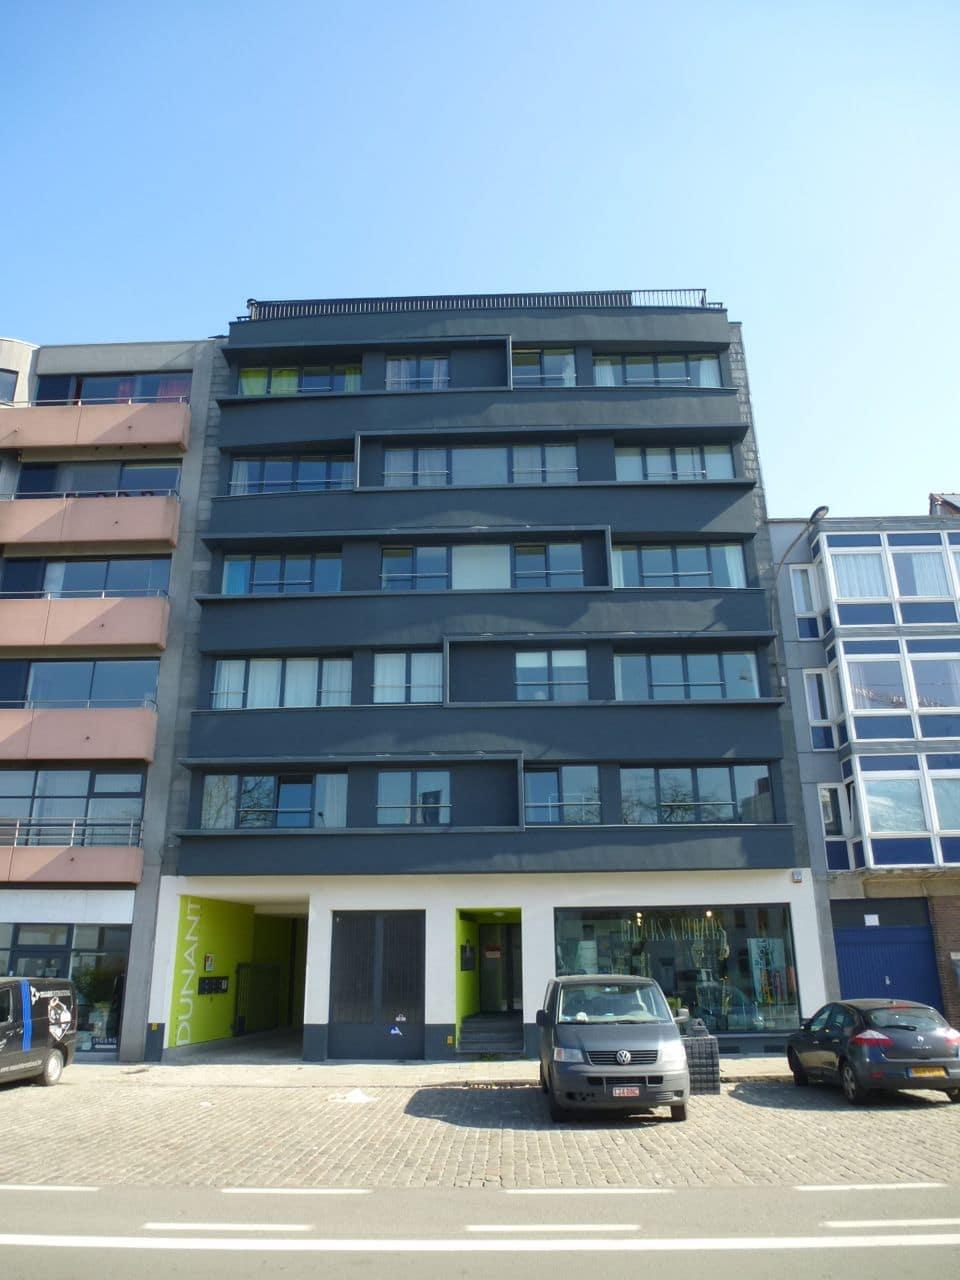 P1120119 | Baeyens & Beck architecten Gent | architect nieuwbouw renovatie interieur | high end | architectenbureau